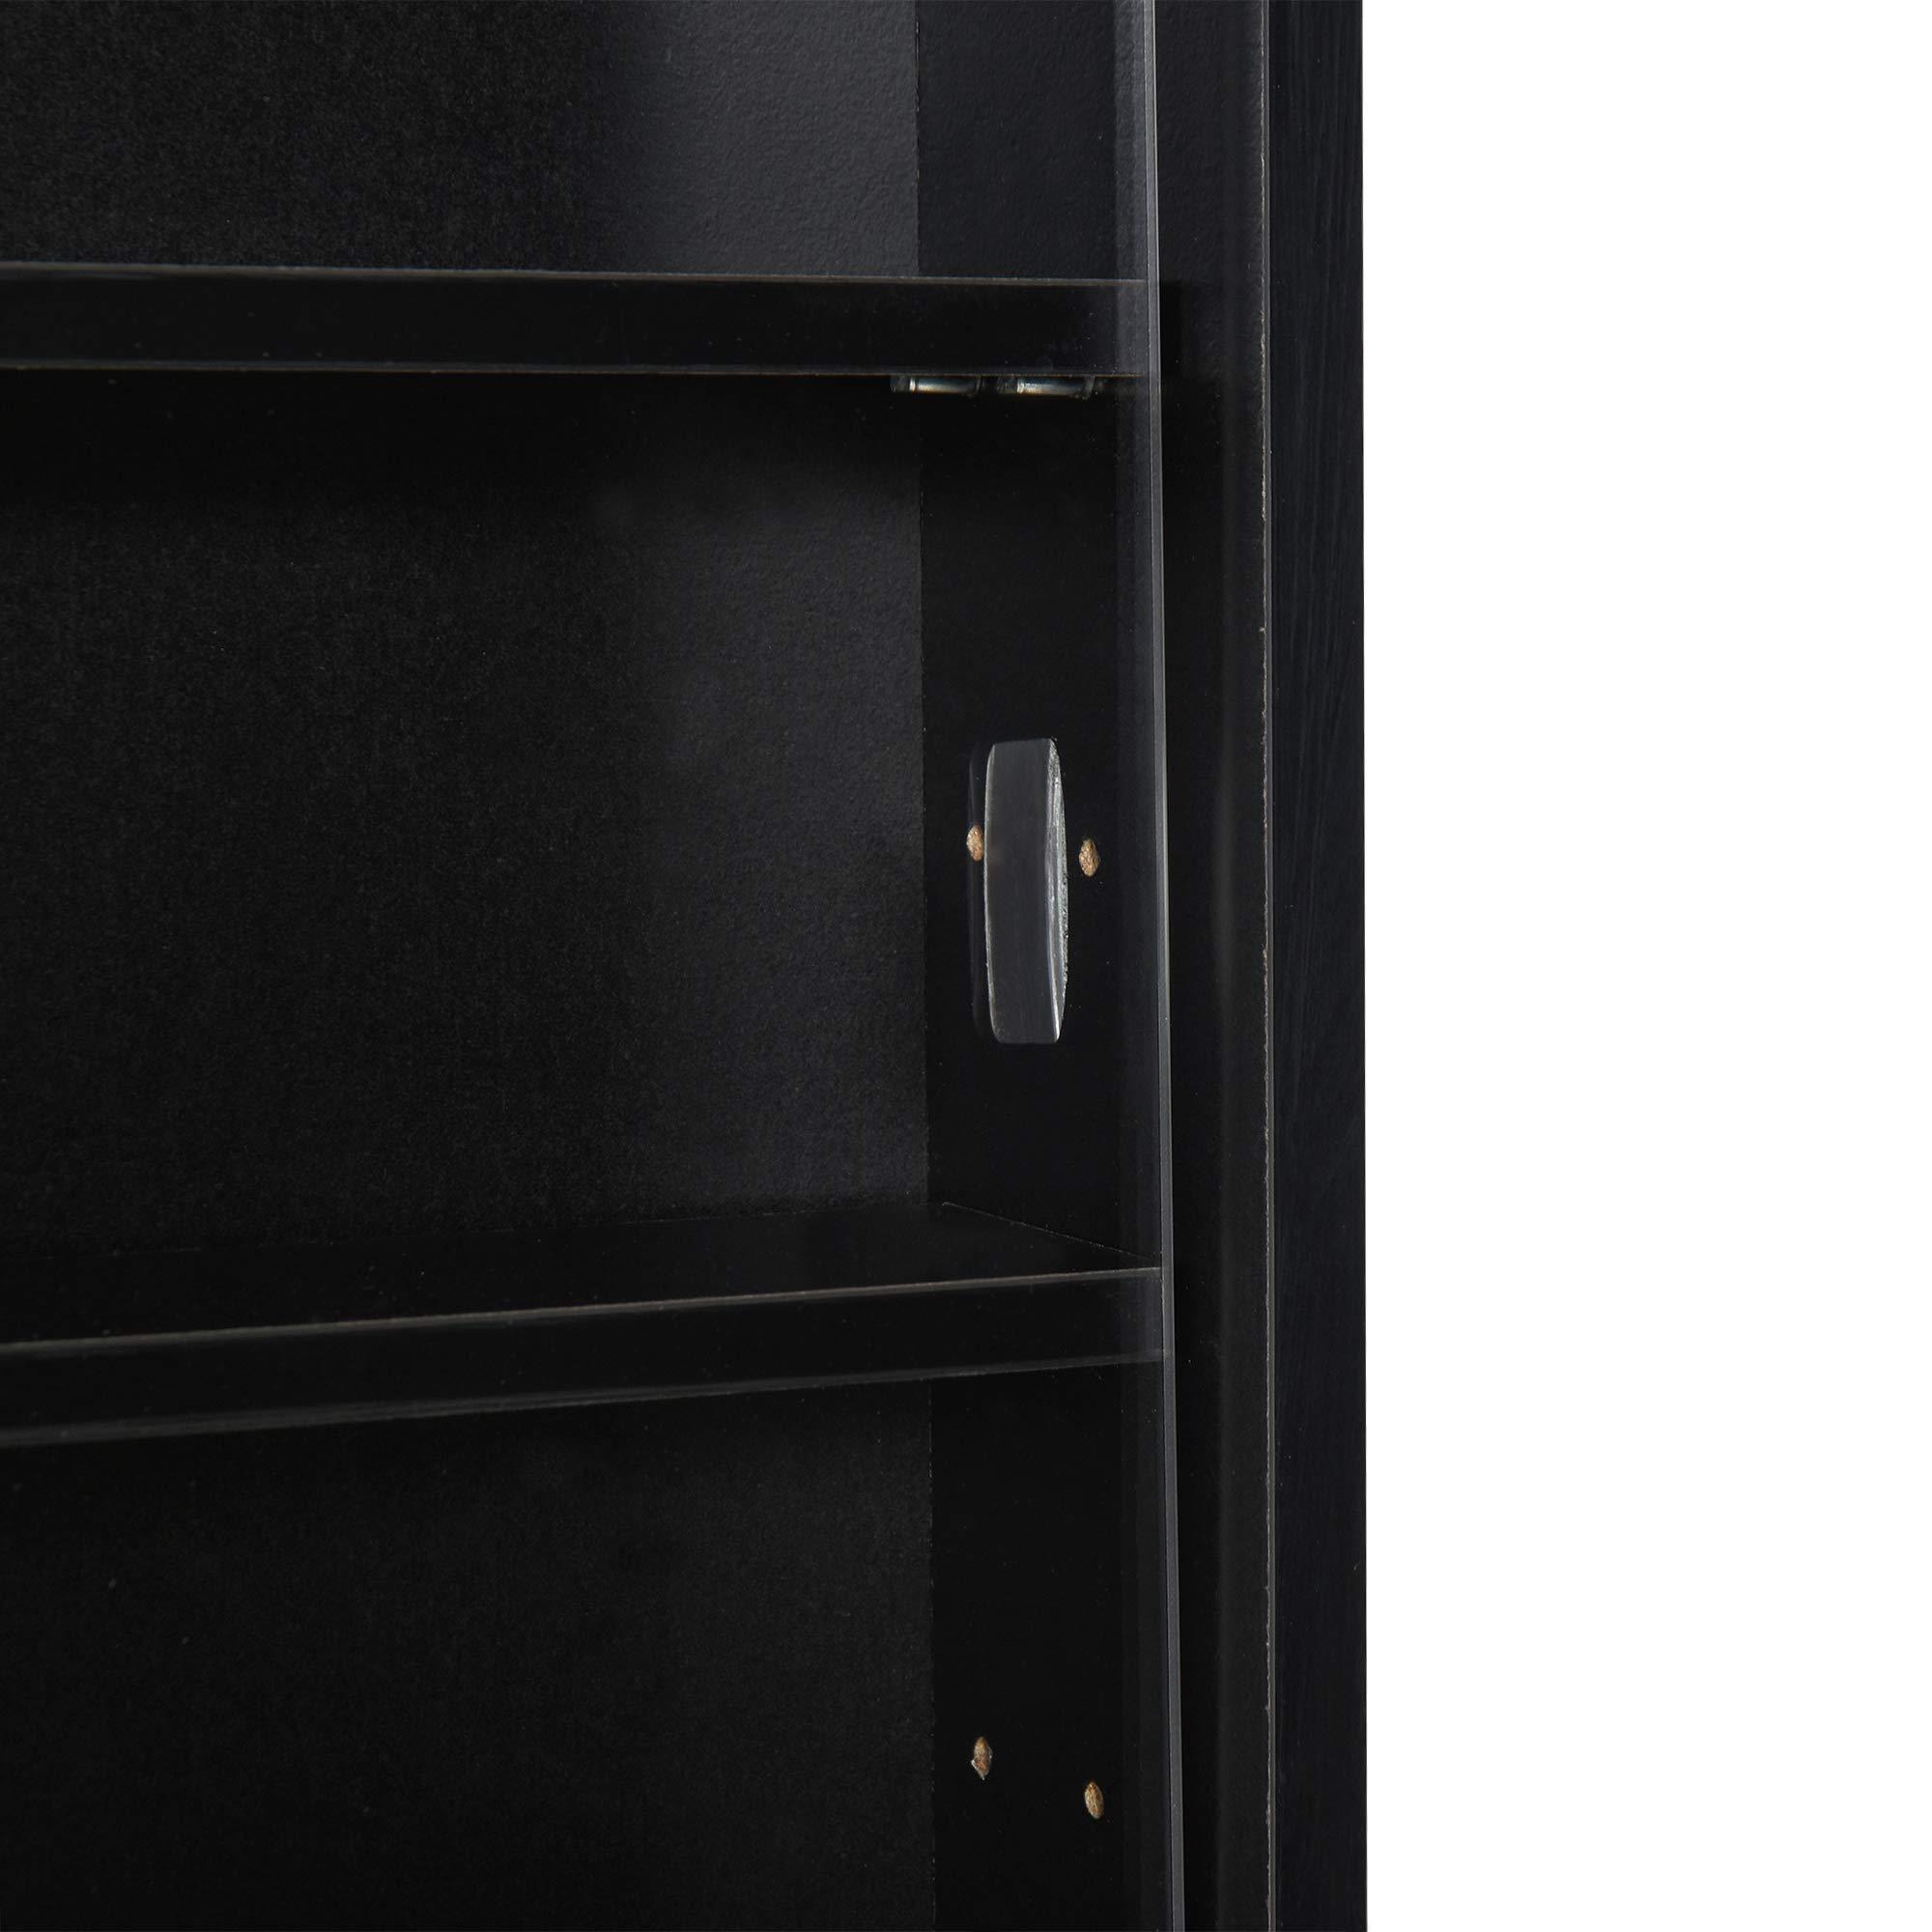 HOMCOM 5-Tier Wall Display Shelf Unit Cabinet w// 4 Adjustable Shelves Glass Doors Home Office Ornaments 60x80cm Black//White